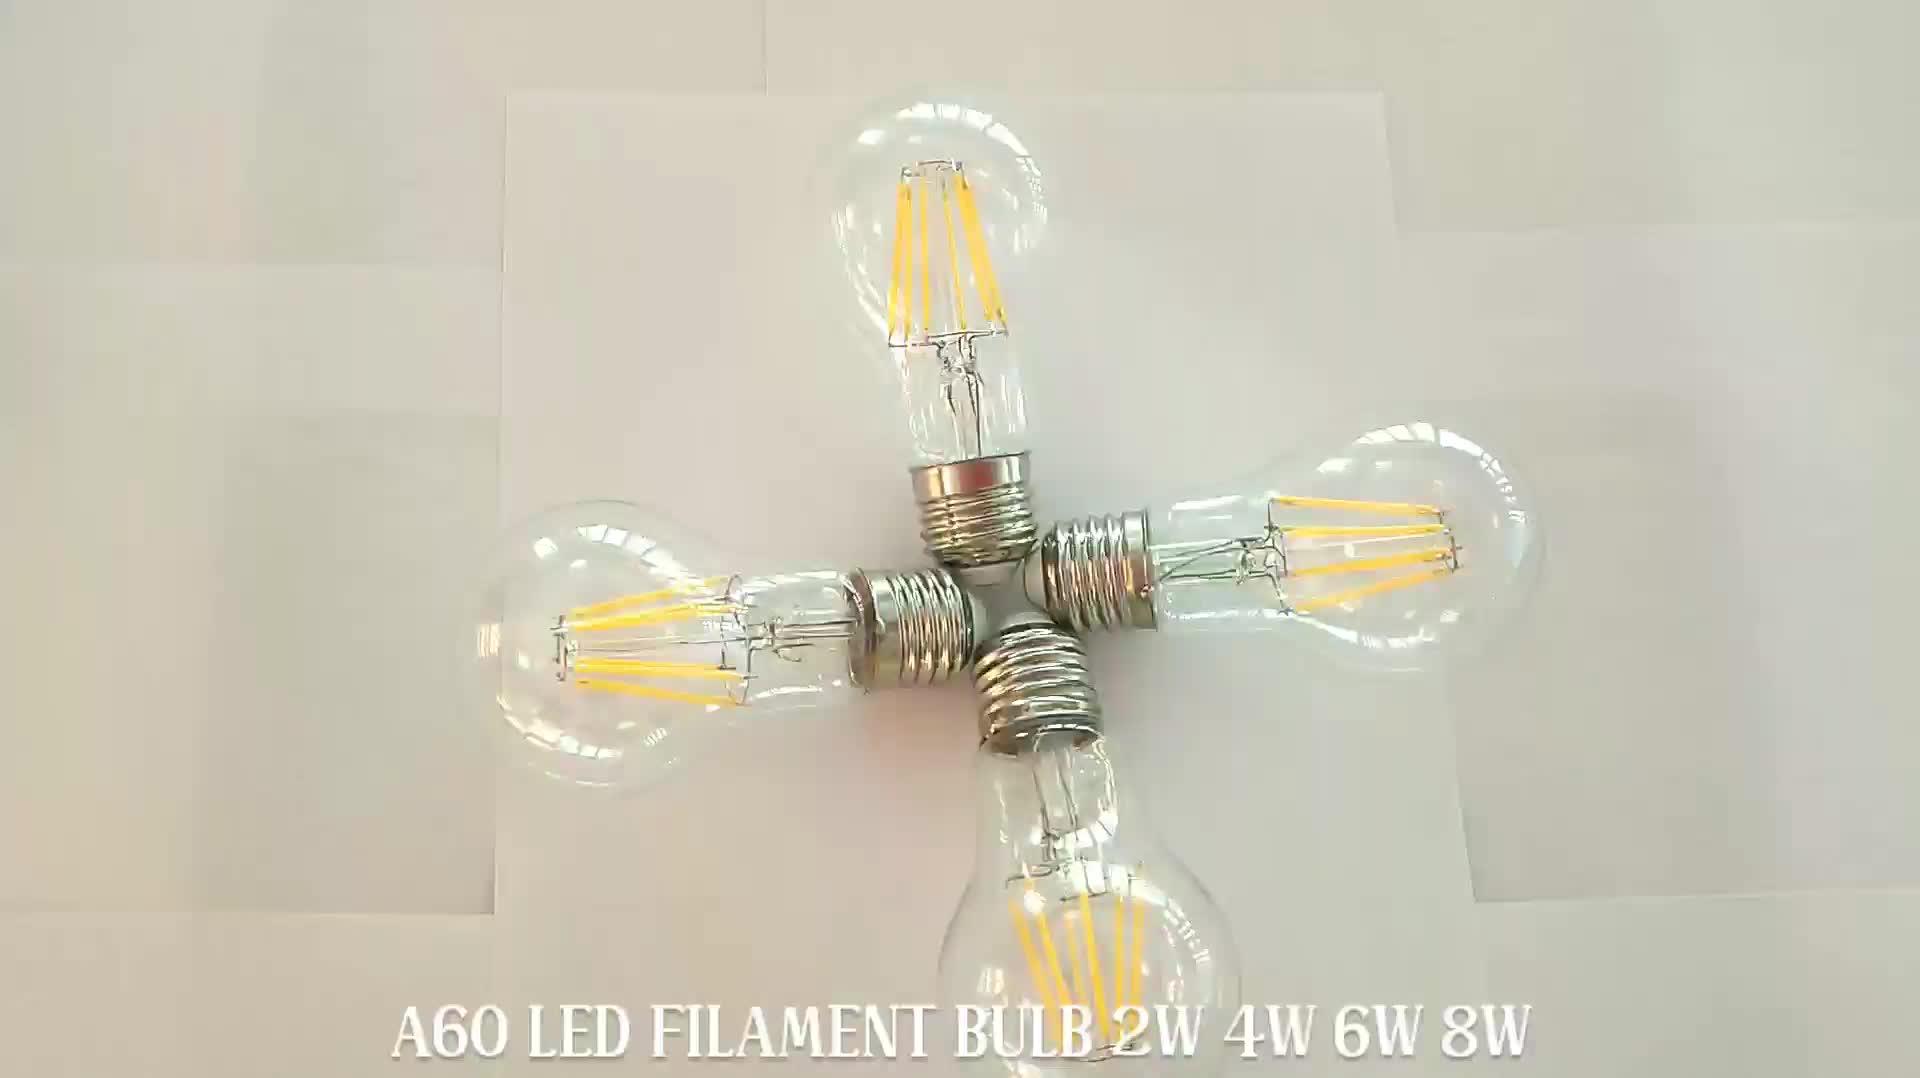 Led Plant Grow Light A60 4W 6W 8W E27 Filament Bulb